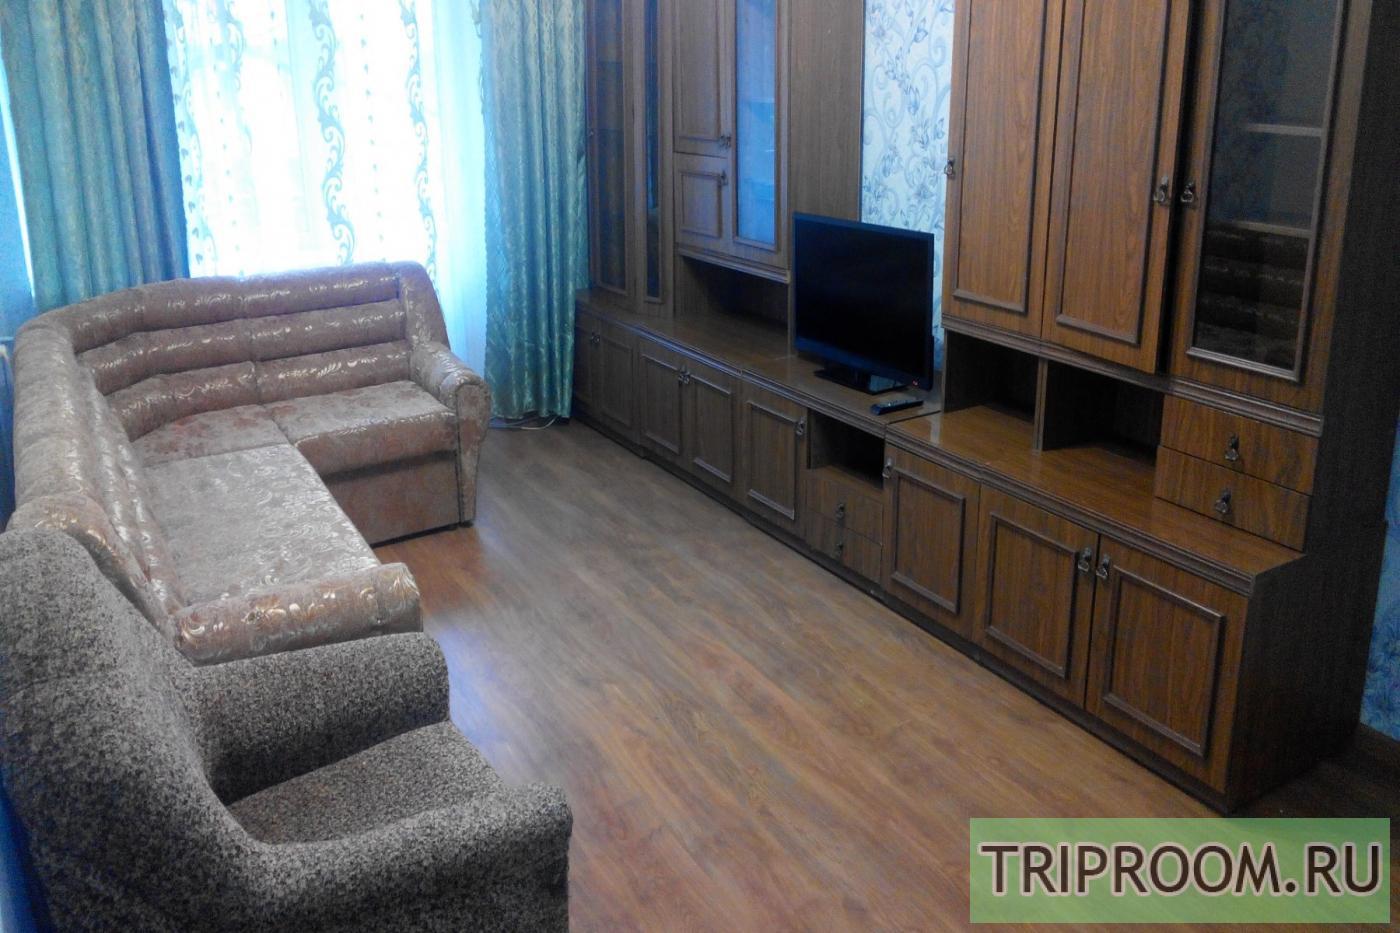 3-комнатная квартира посуточно (вариант № 30860), ул. Гагарина улица, фото № 6